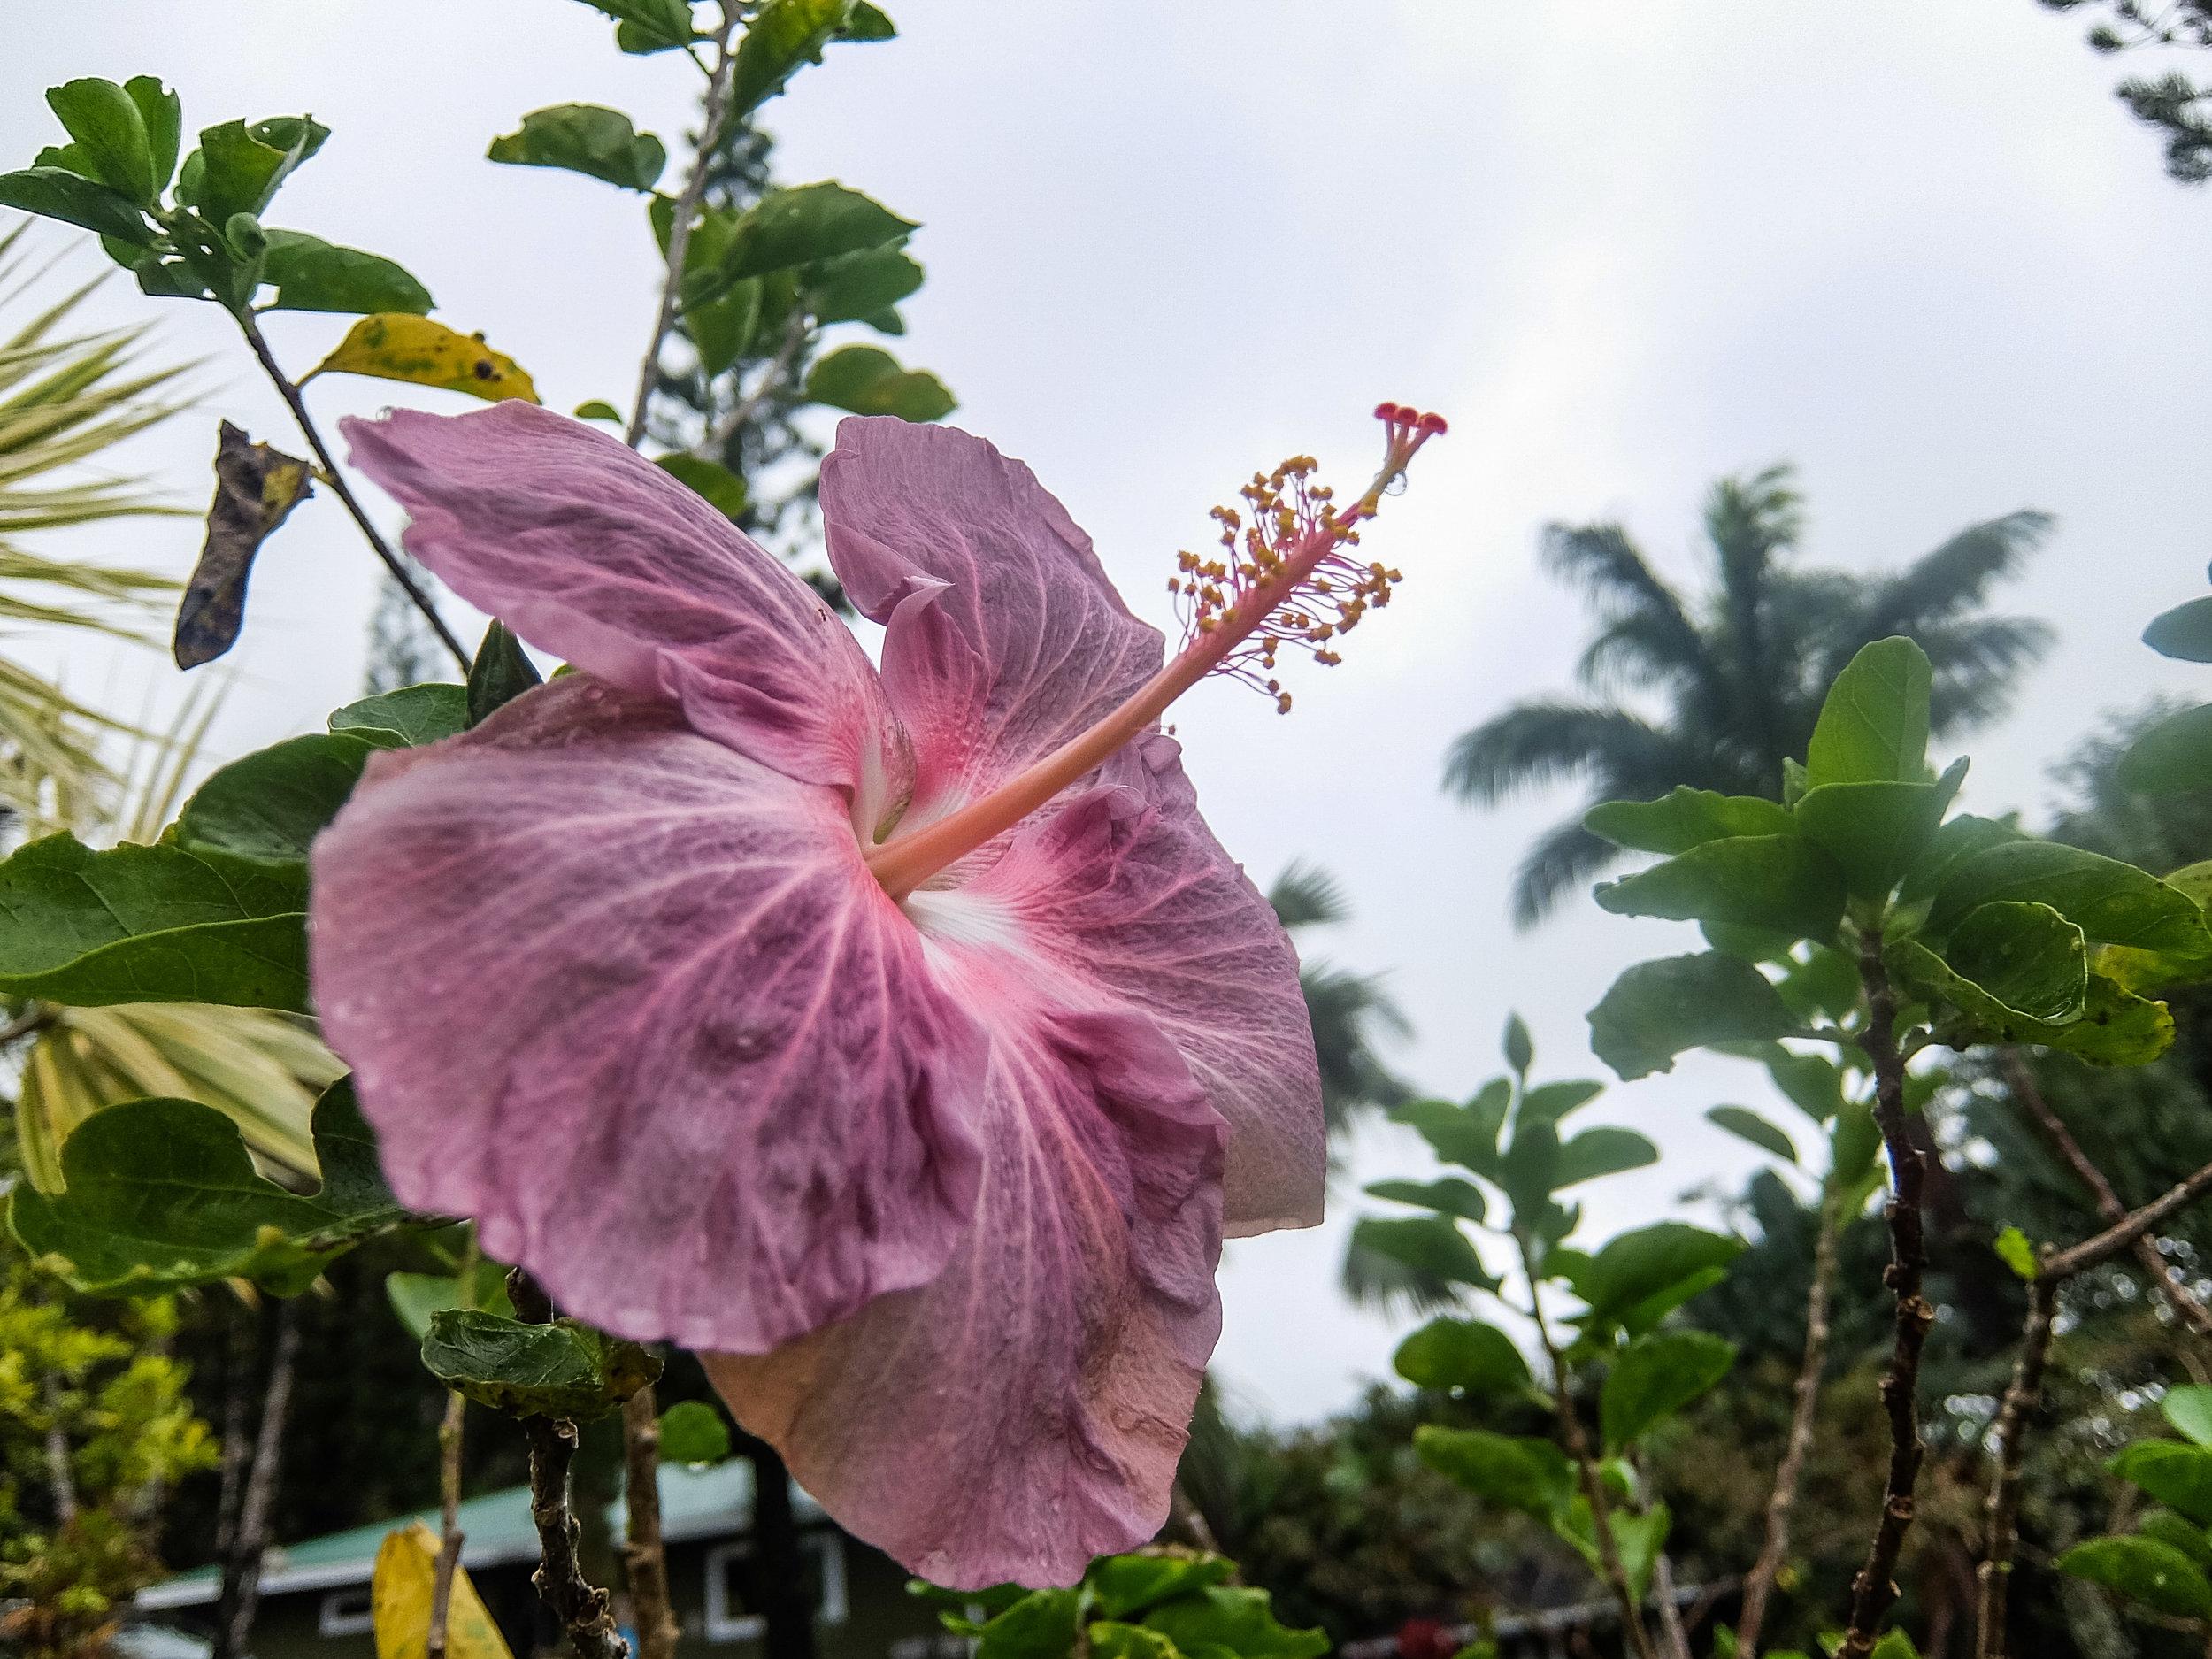 Hibiscus flower in Haleakala National Park on the island of Maui, Hawai'i.